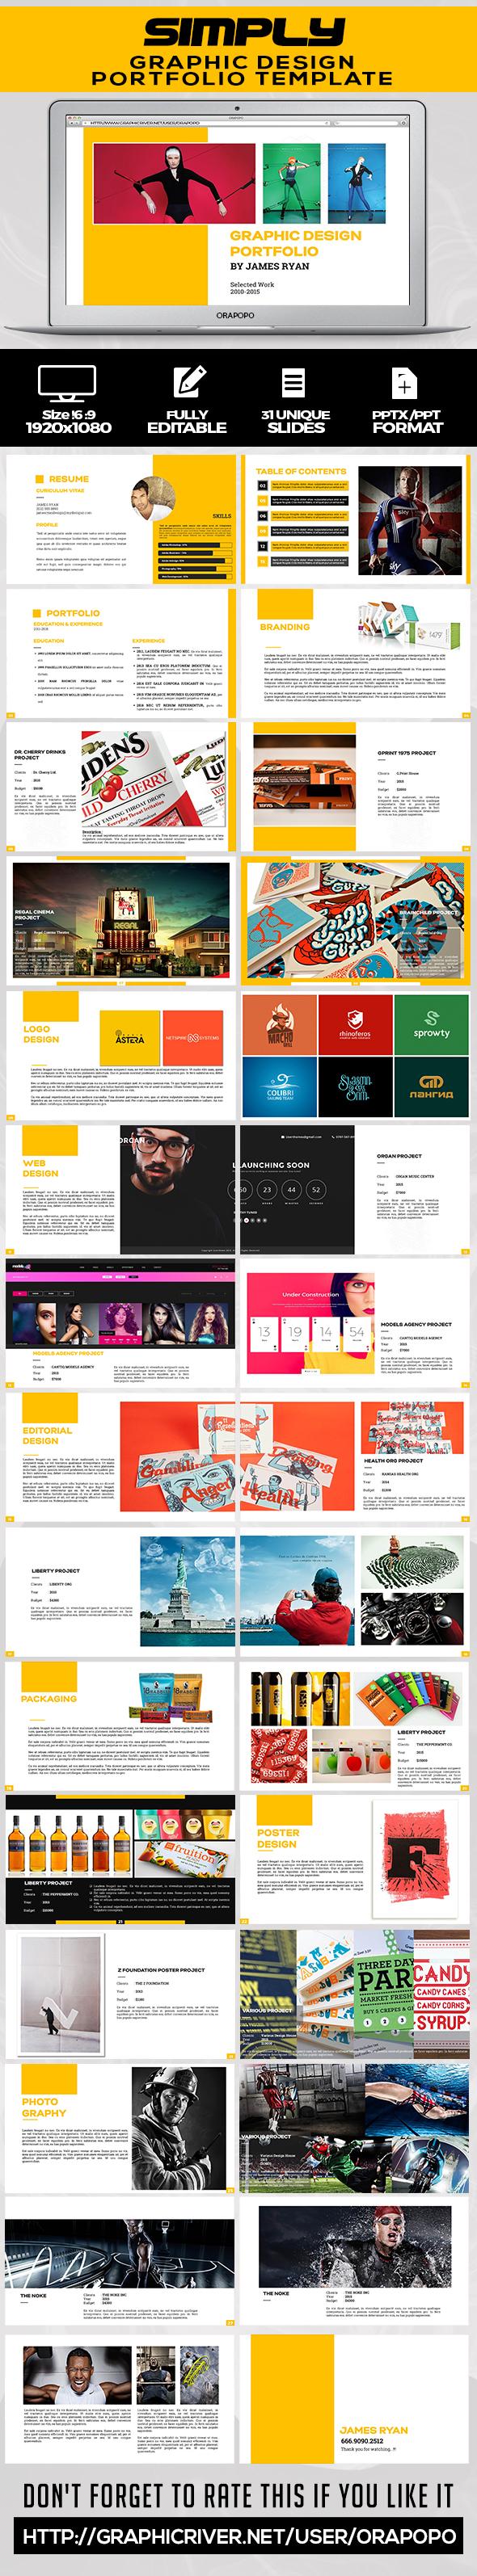 Graphic Design Portfolio Template - Creative PowerPoint Templates